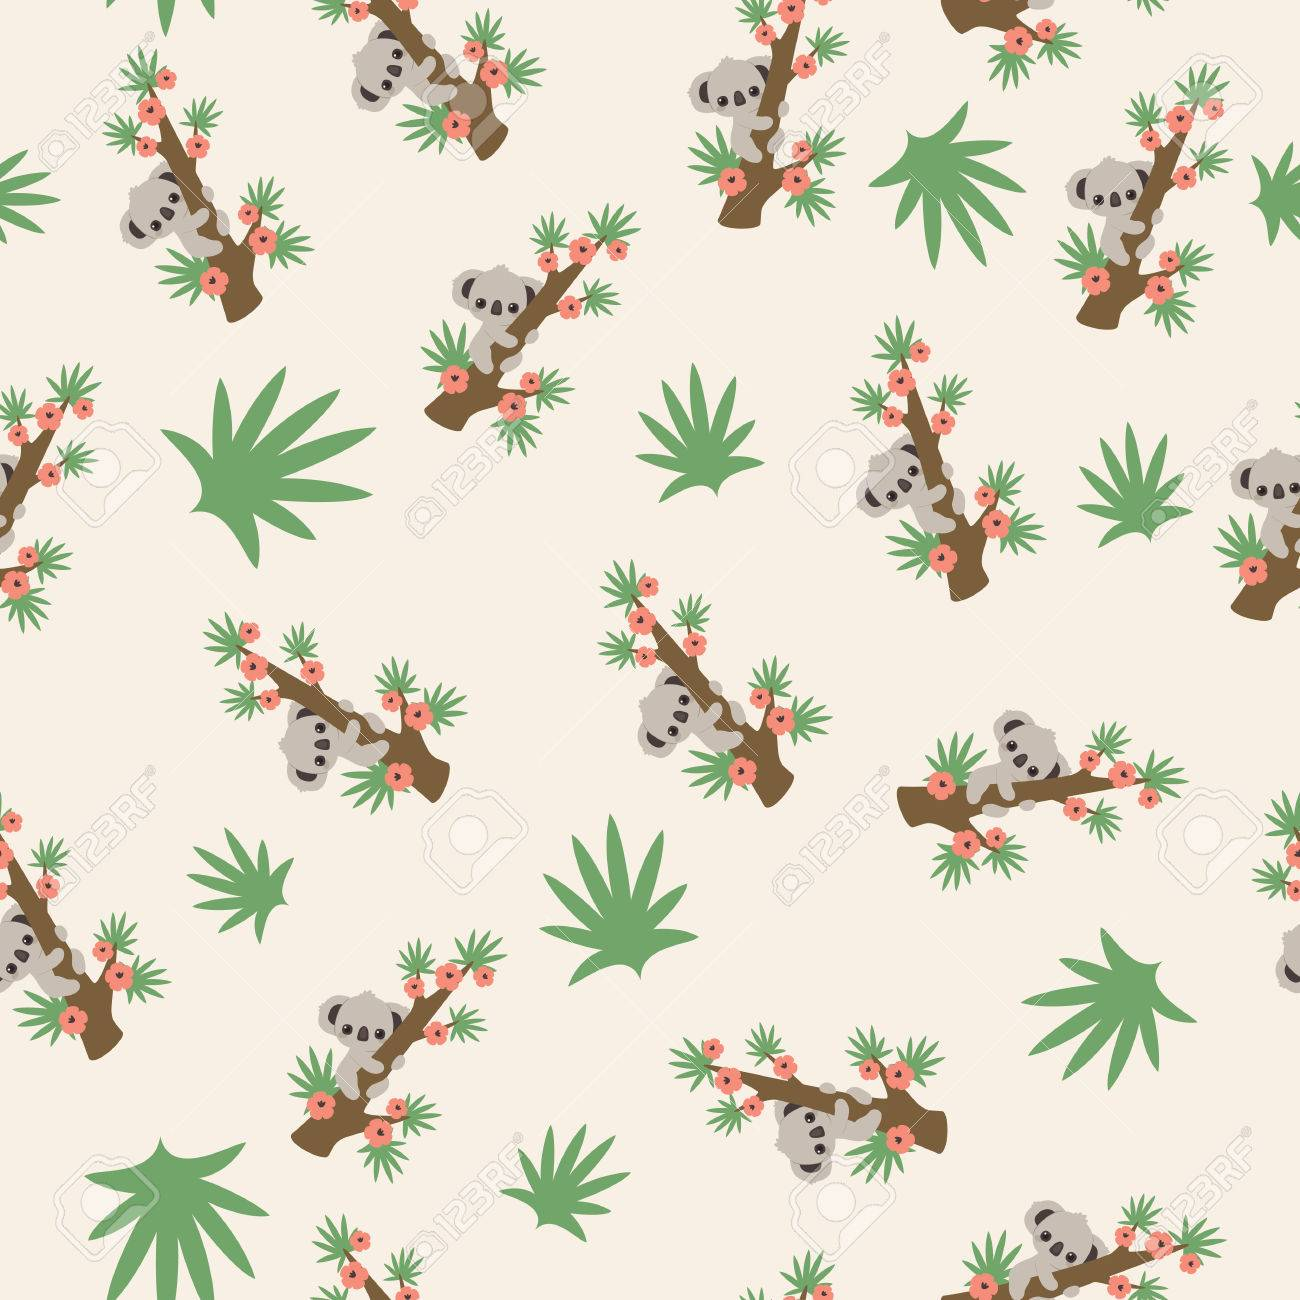 Most Inspiring Wallpaper Koala Cartoon - 84360456-cute-cartoon-koala-on-a-tree-pattern-wallpaper  Pic_94322   .jpg